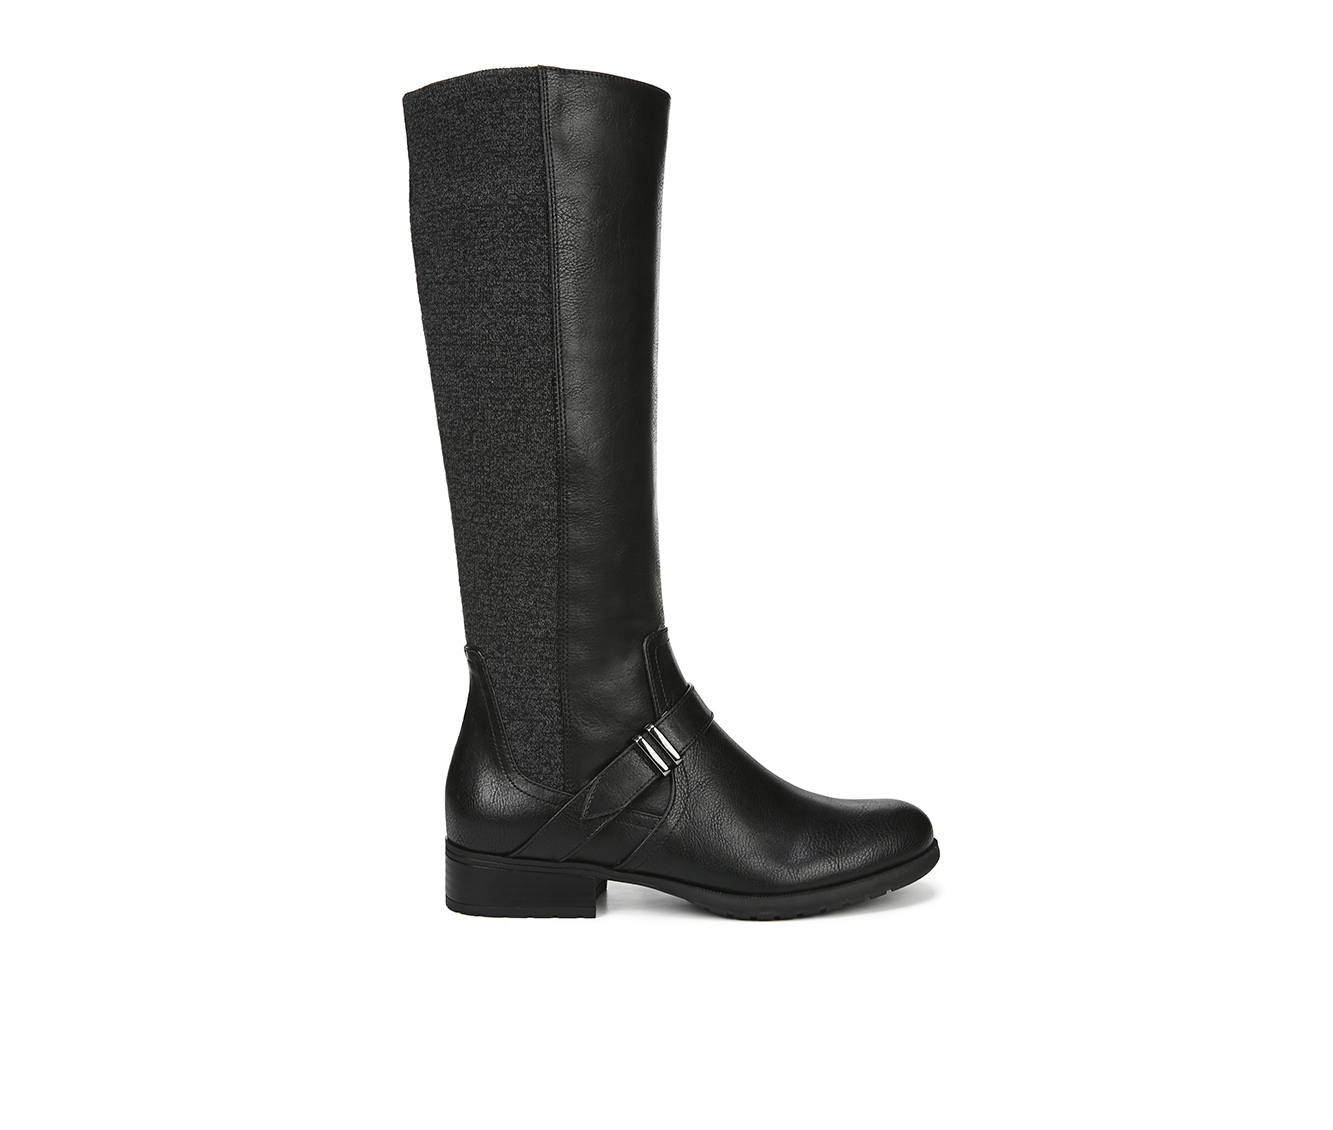 LifeStride Xtra Women's Boots (Black)